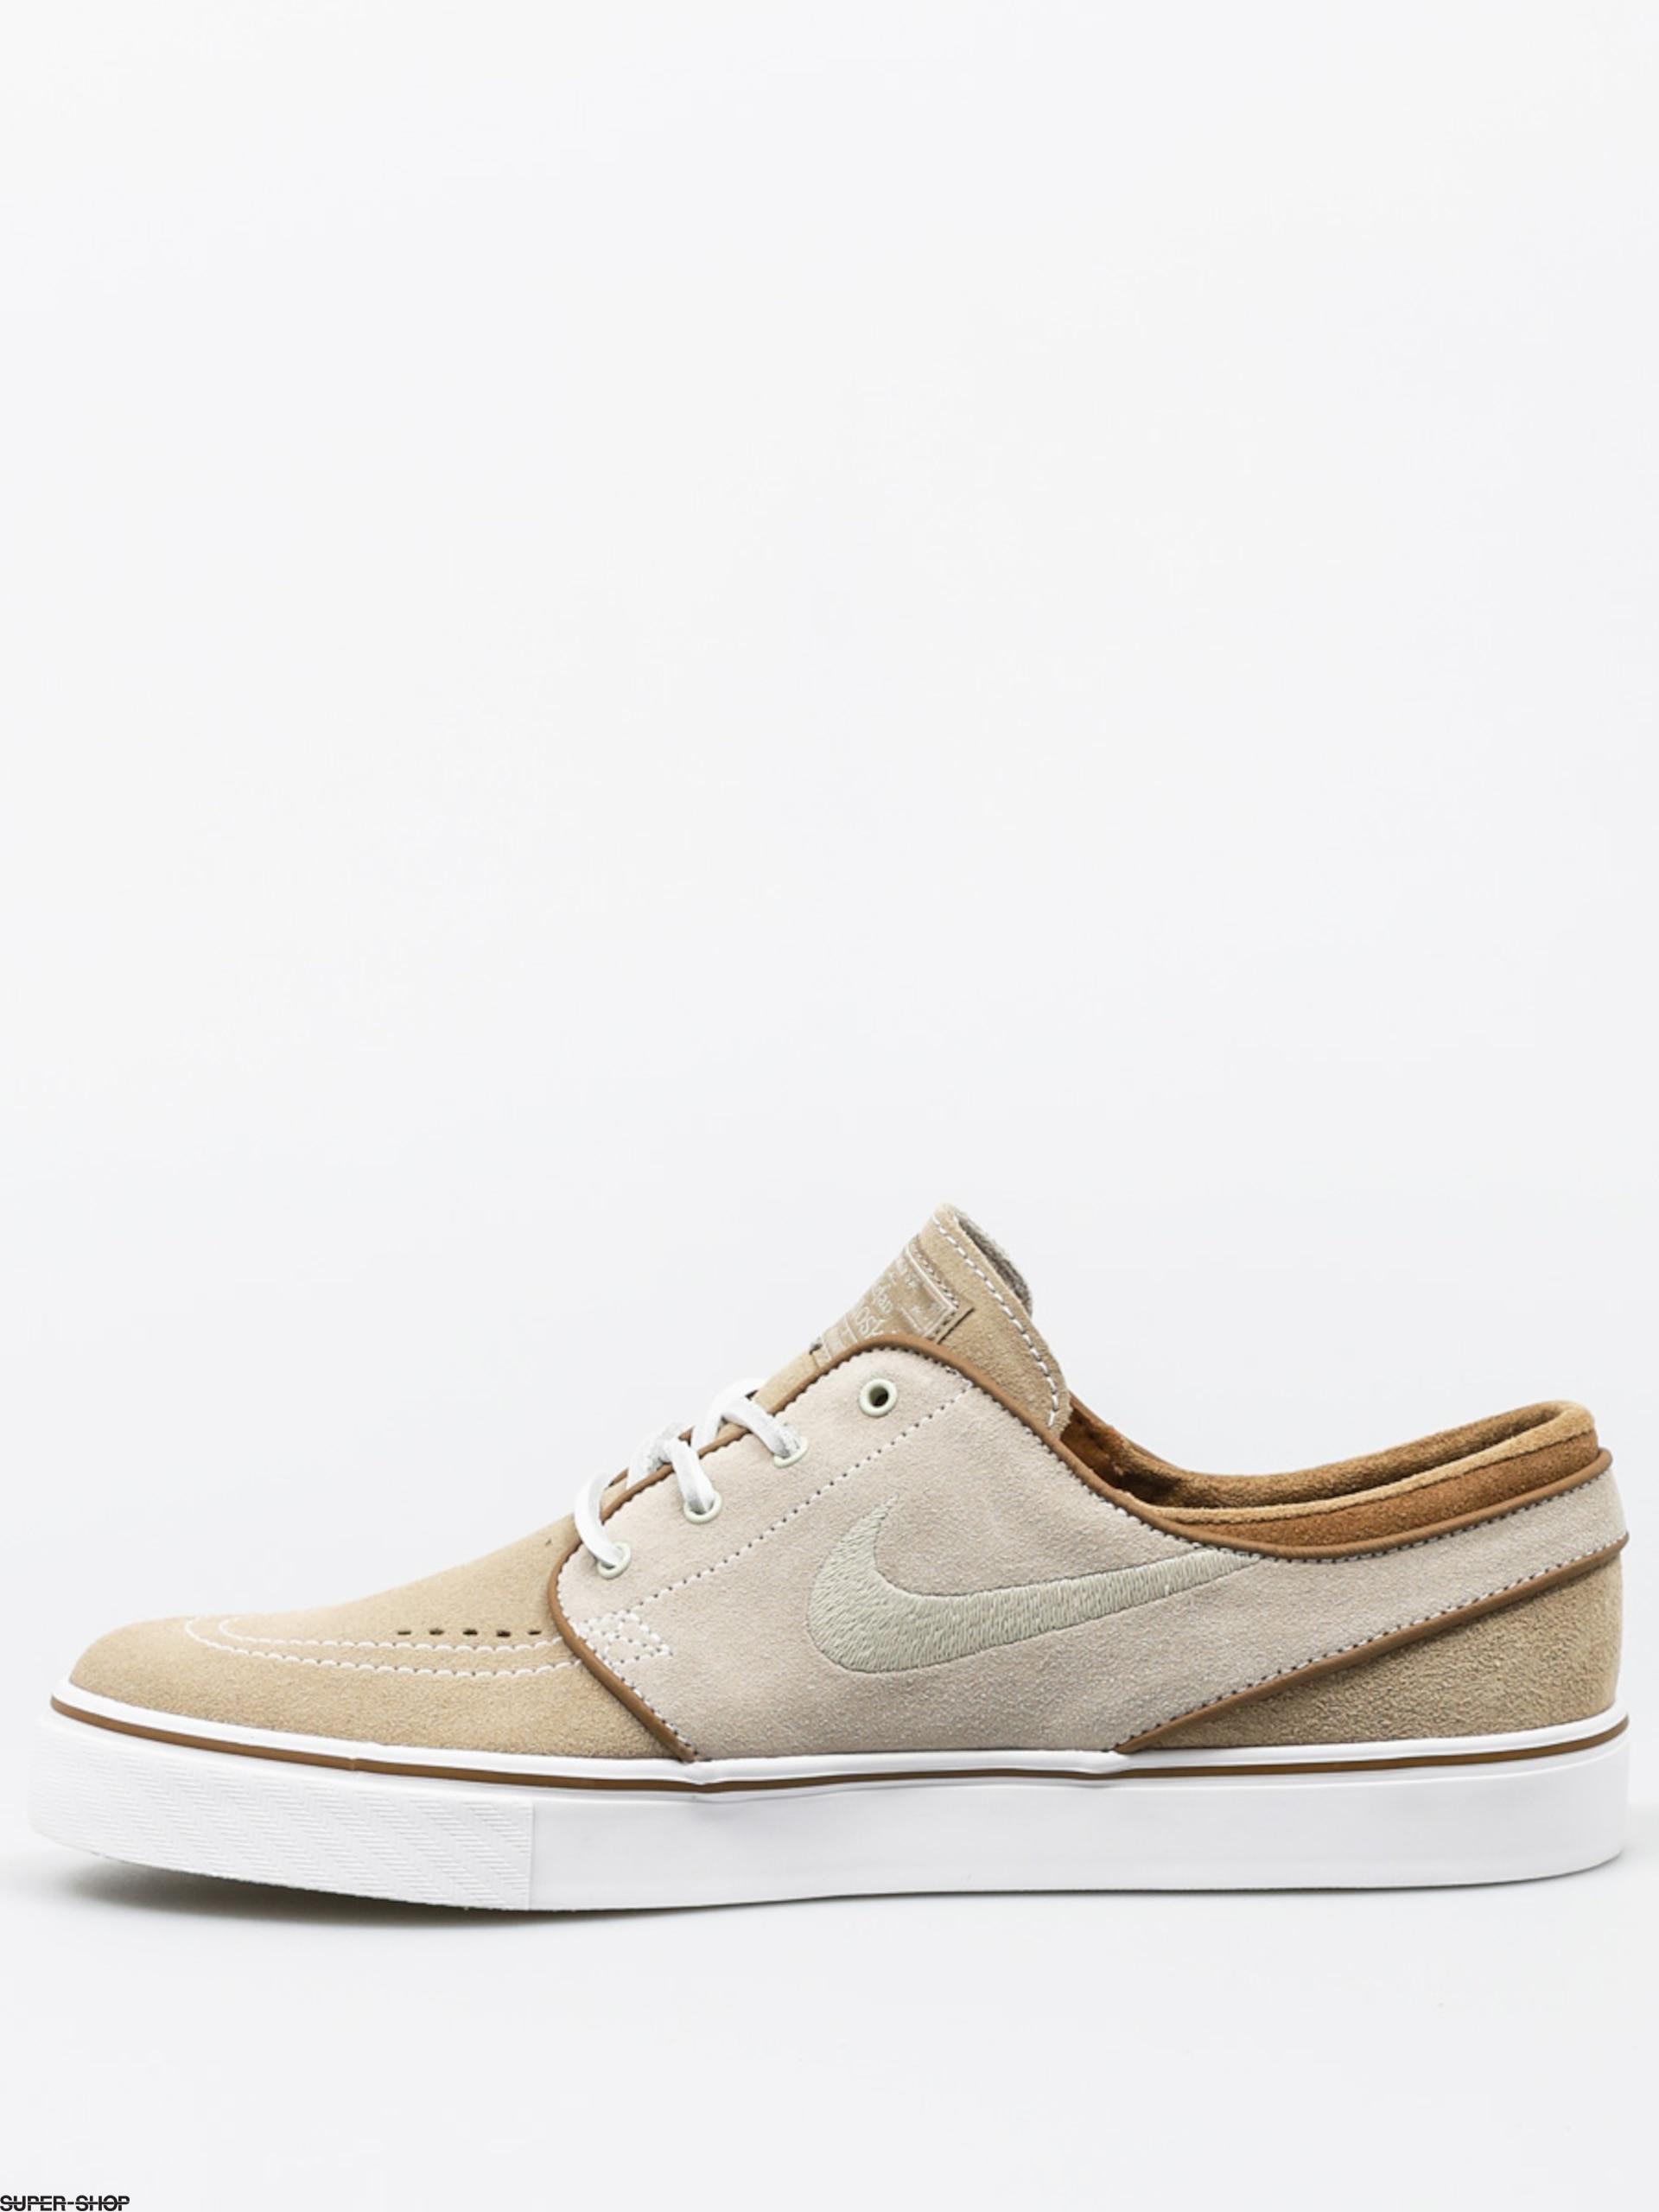 a6d270c59784 Nike SB Shoes Zoom Stefan Janoski Og (reed reed stone rocky tan)